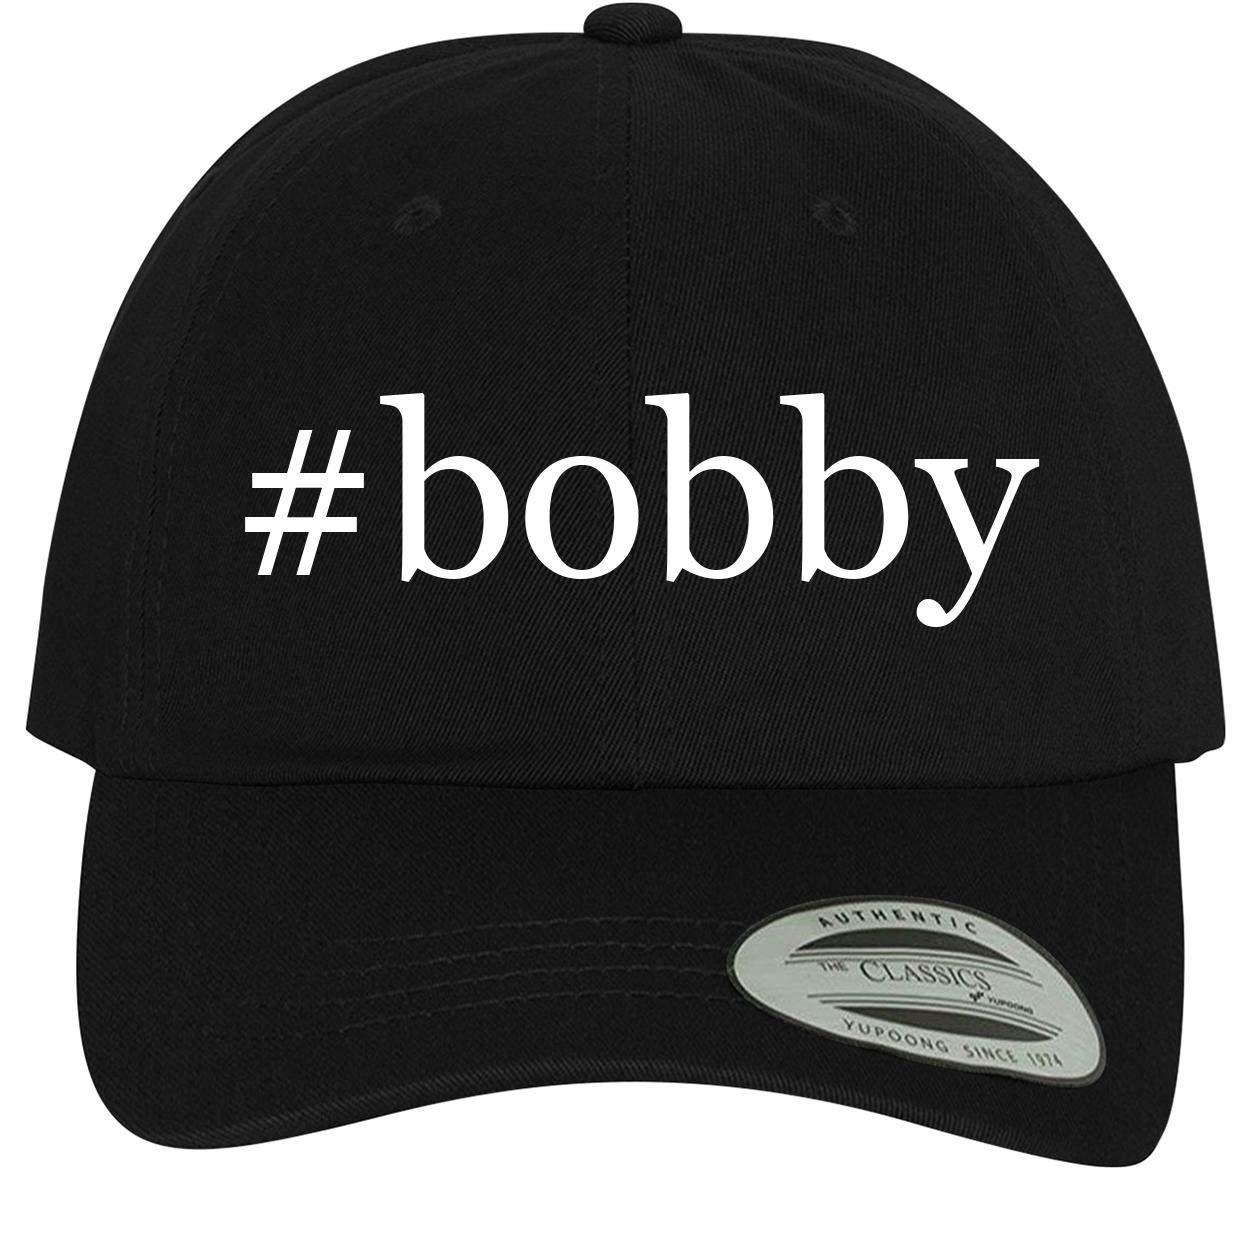 Comfortable Dad Hat Baseball Cap BH Cool Designs #Bobby